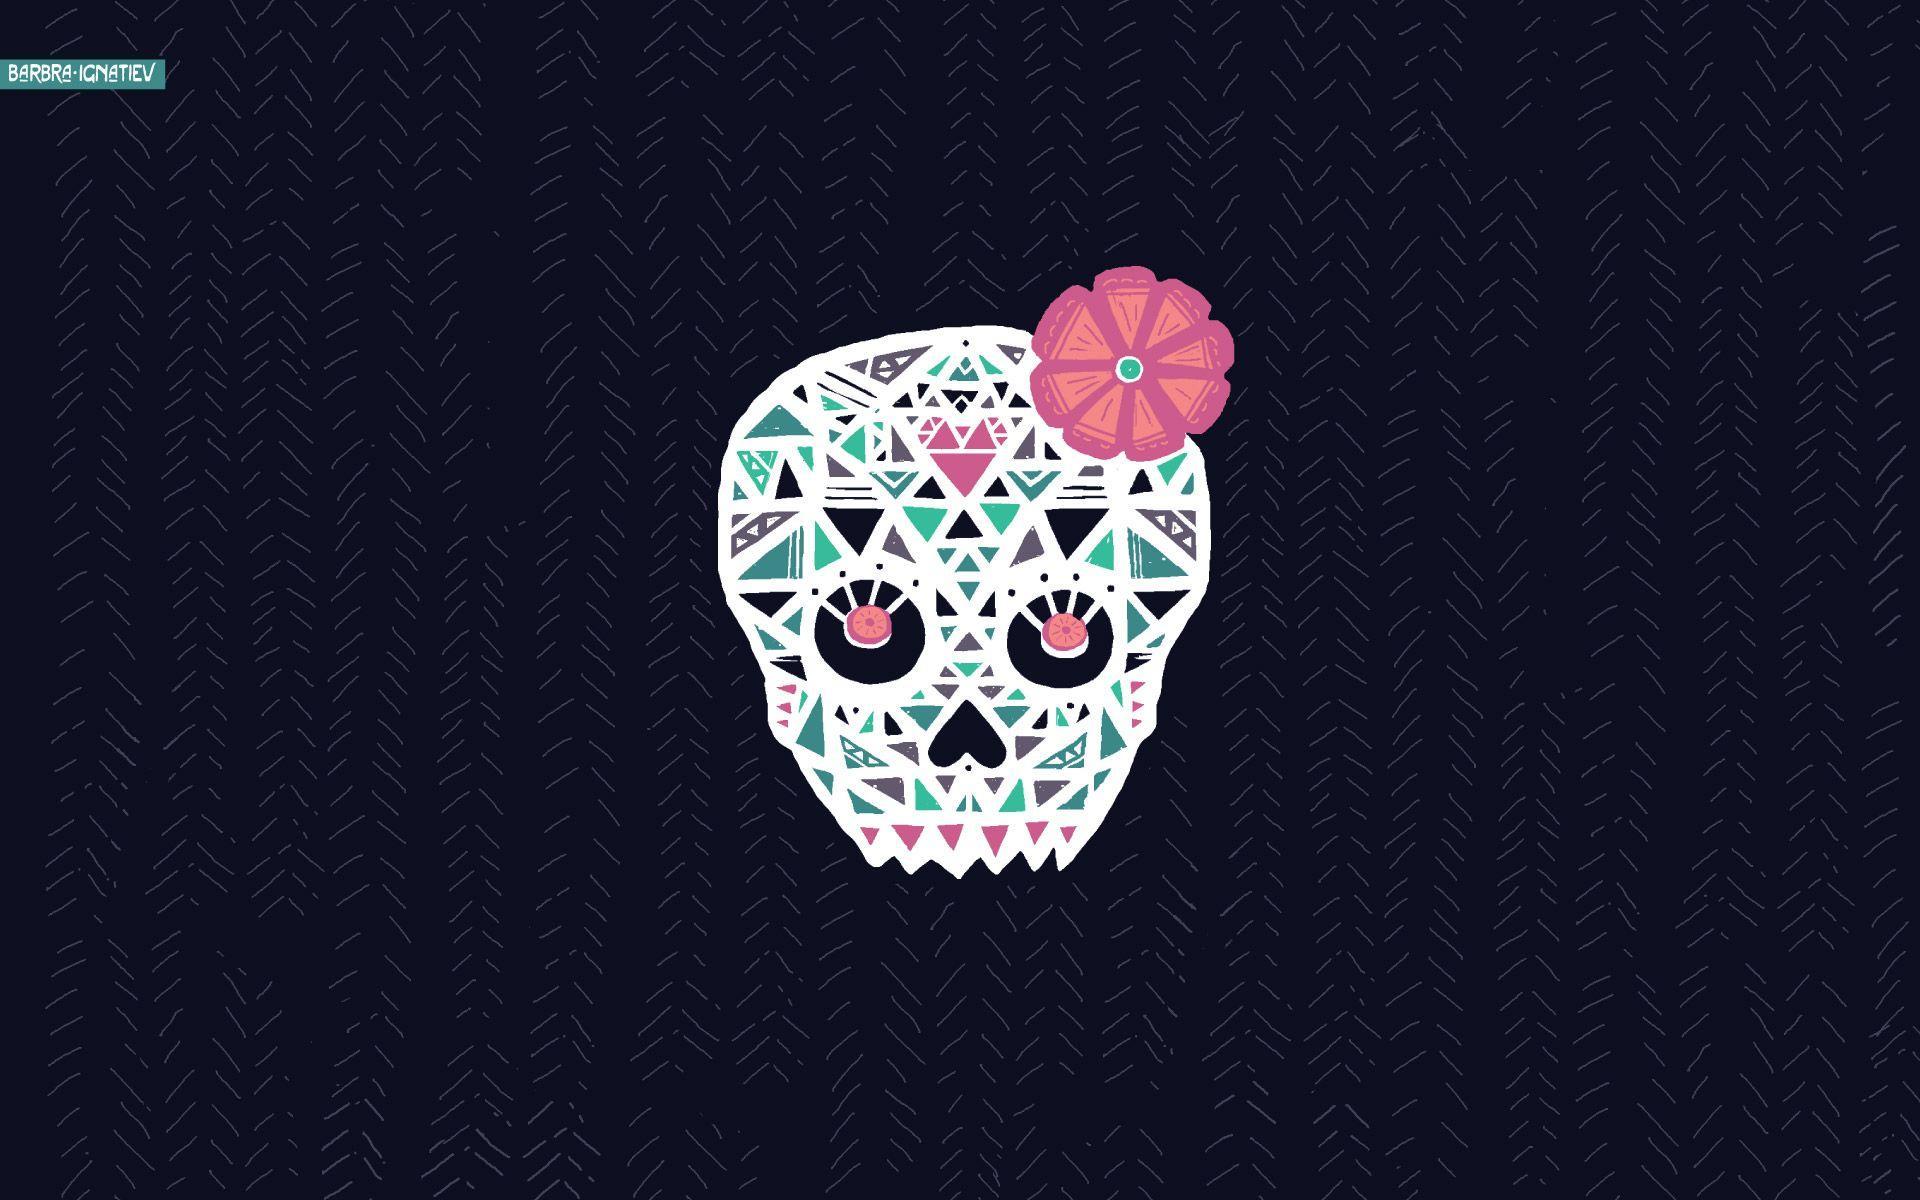 Skeleton wallpapers for desktop 2015 wallpaper cave - Sugar skull background ...